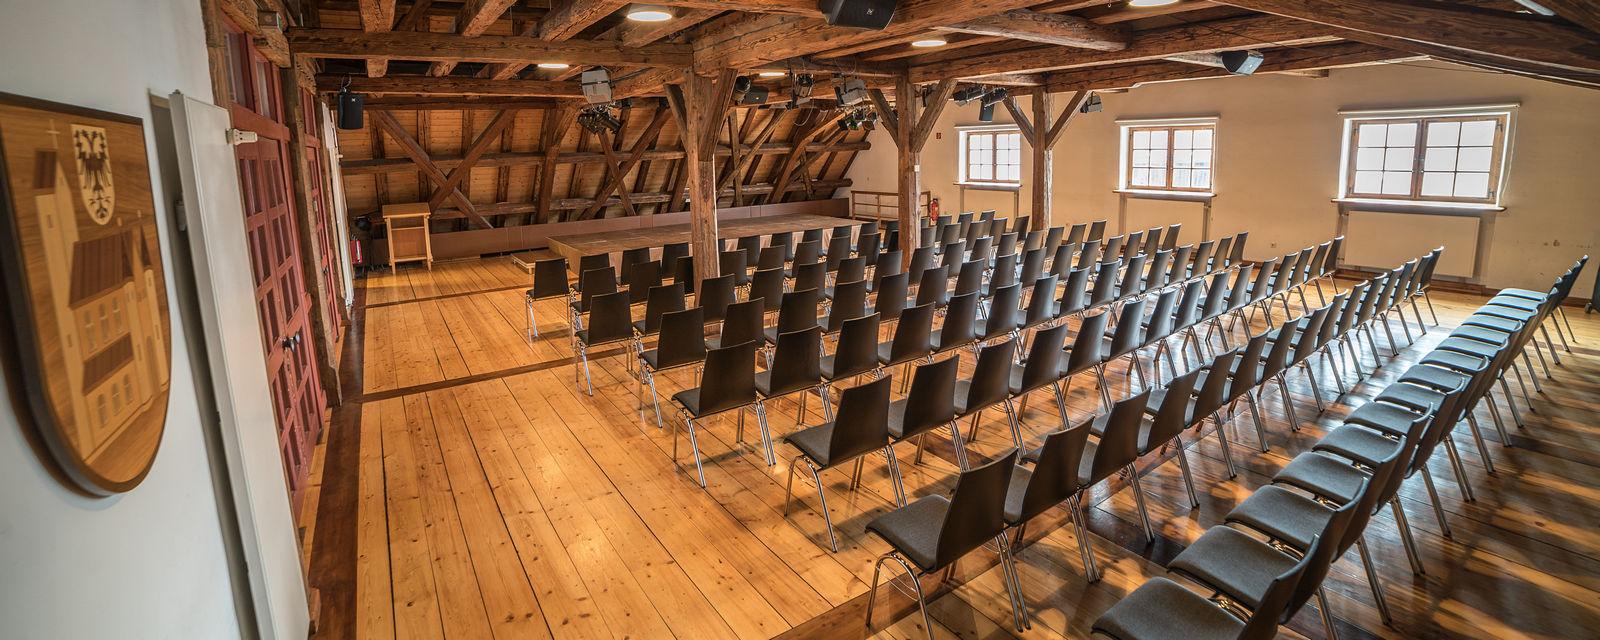 Leutkirch Bocksaal.jpg